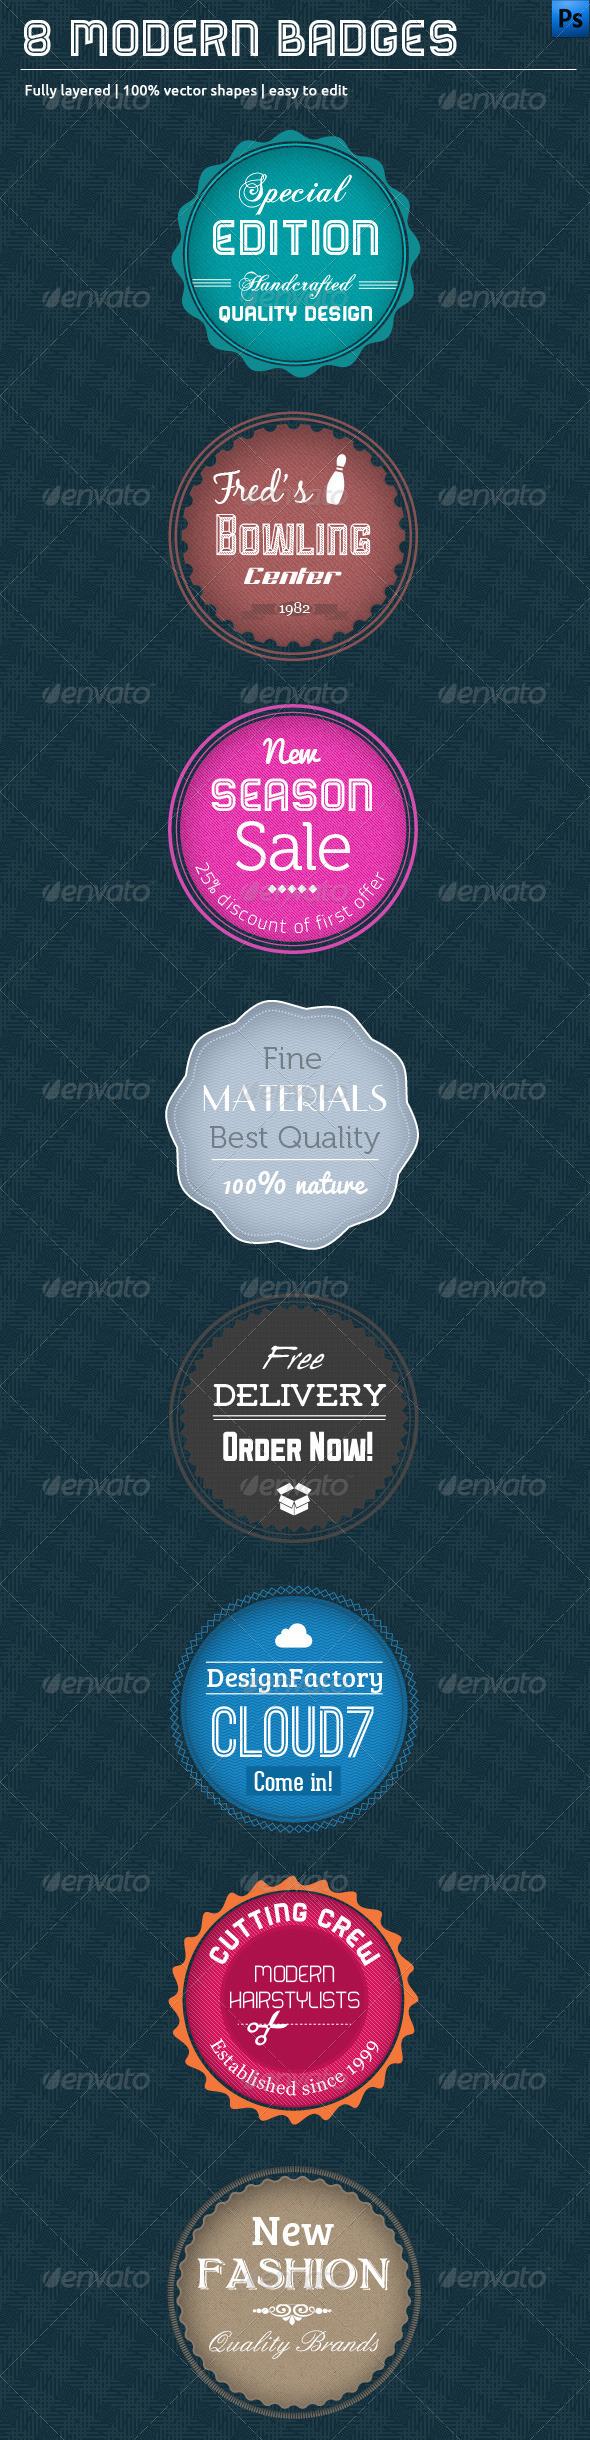 GraphicRiver 8 Modern Badges 3629884